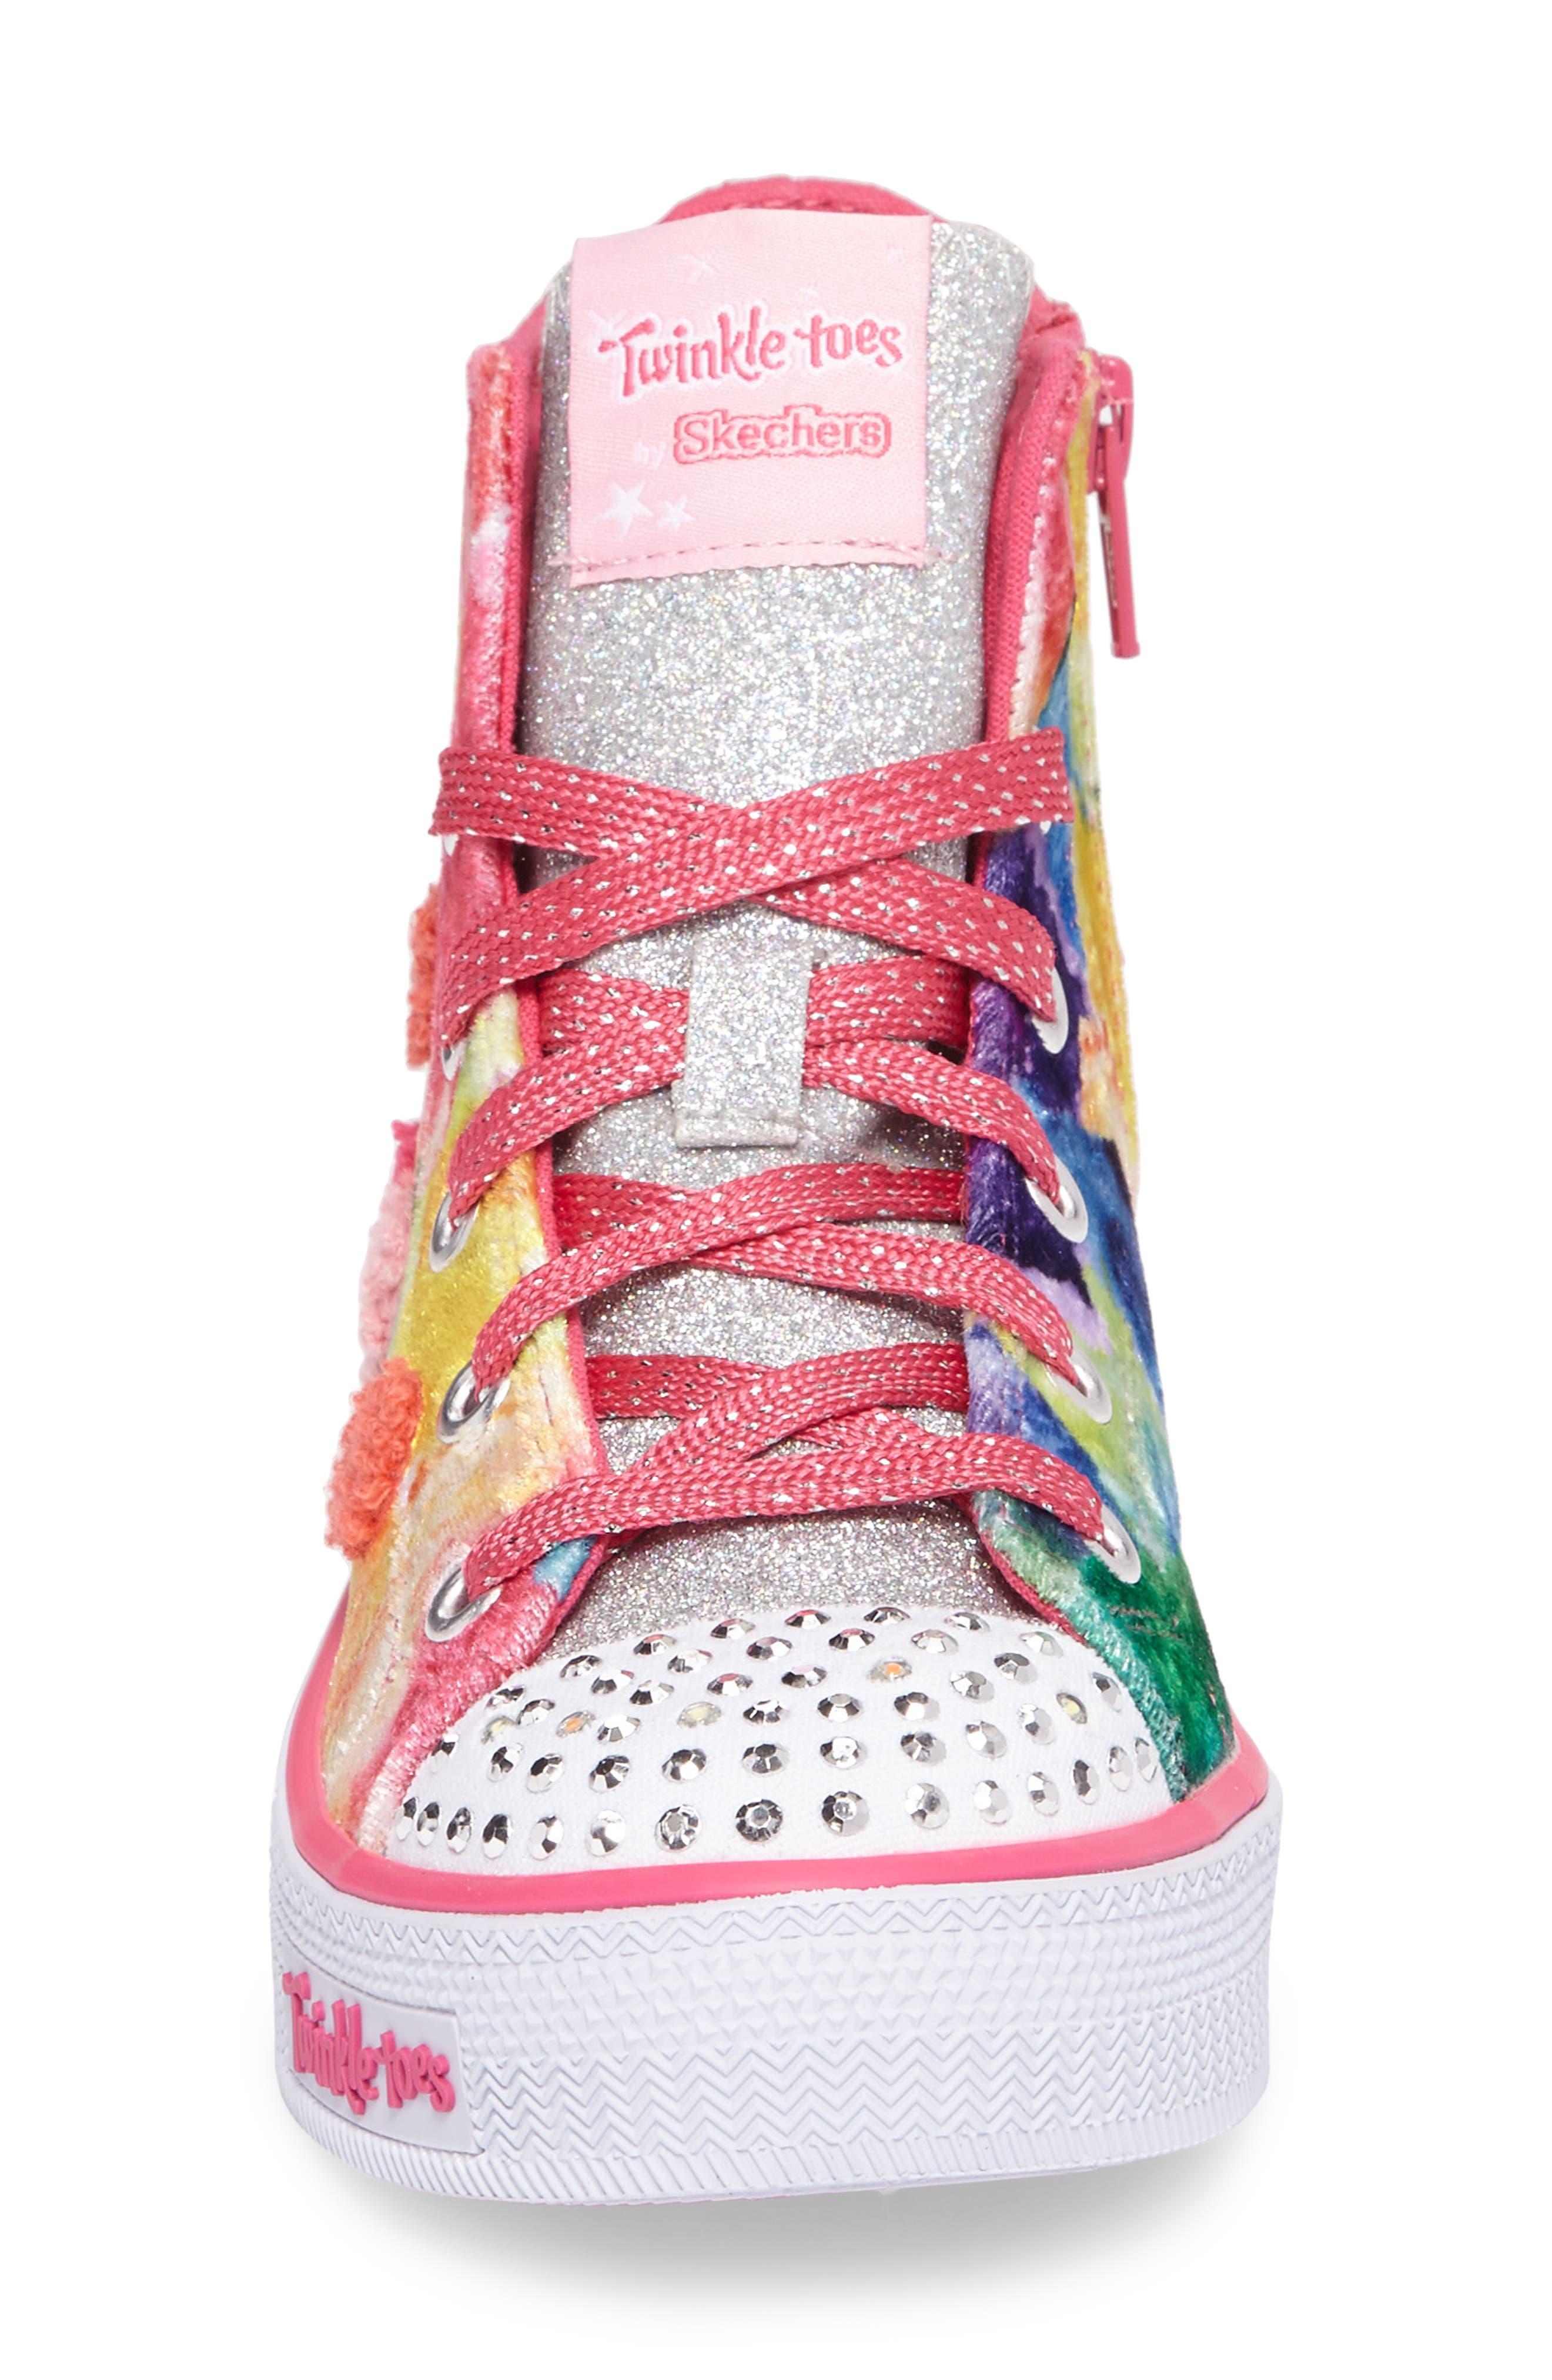 SKECHERS,                             Twinkle Toes Shuffles Light-Up High Top Sneaker,                             Alternate thumbnail 4, color,                             650